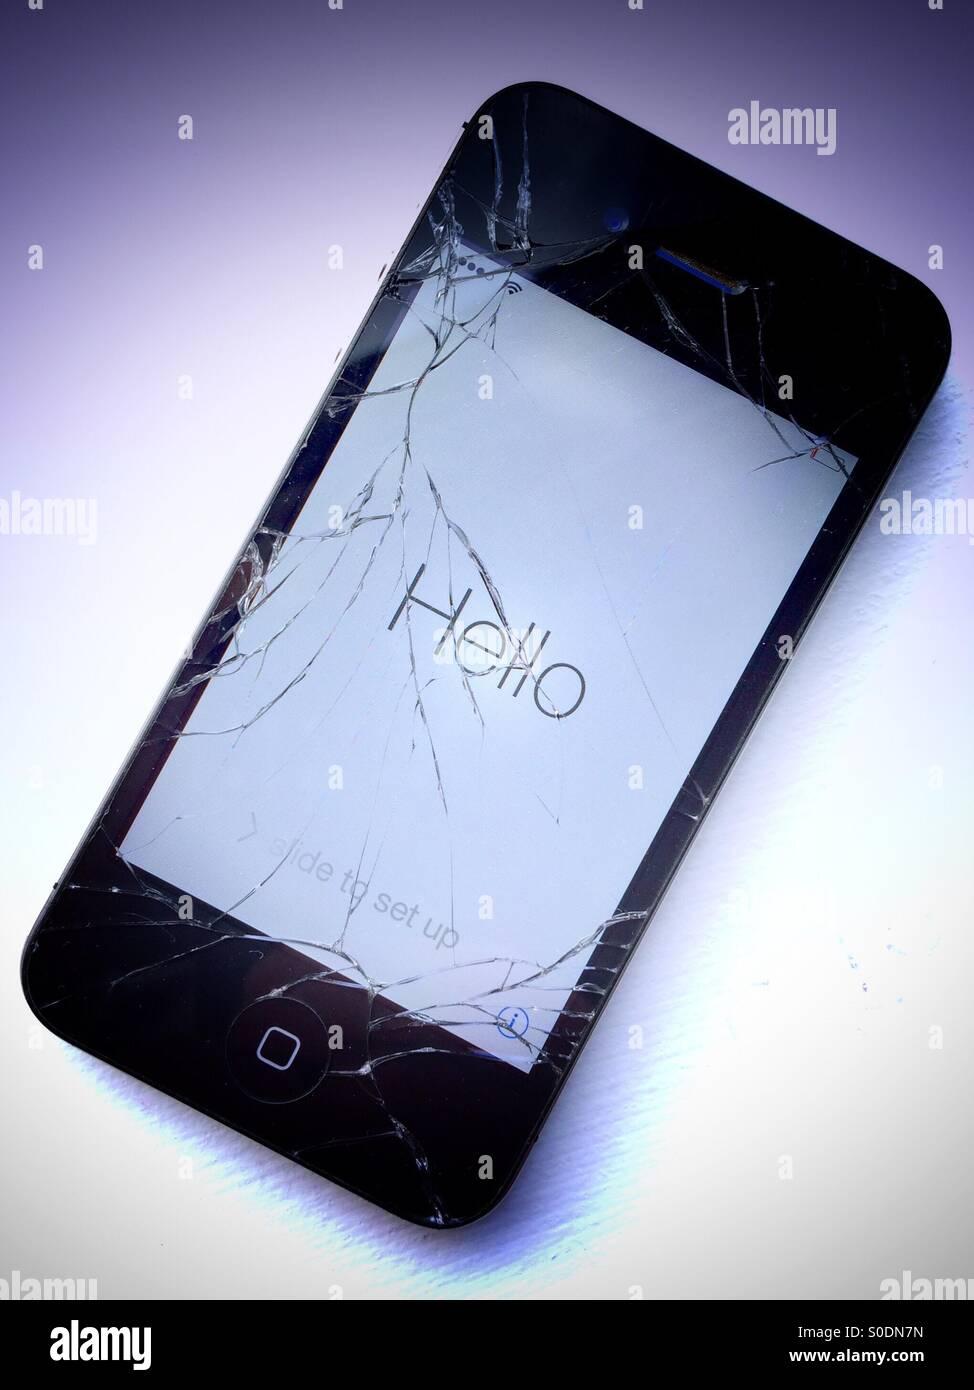 Iphone 4s With Broken Screen Stock Photo Alamy